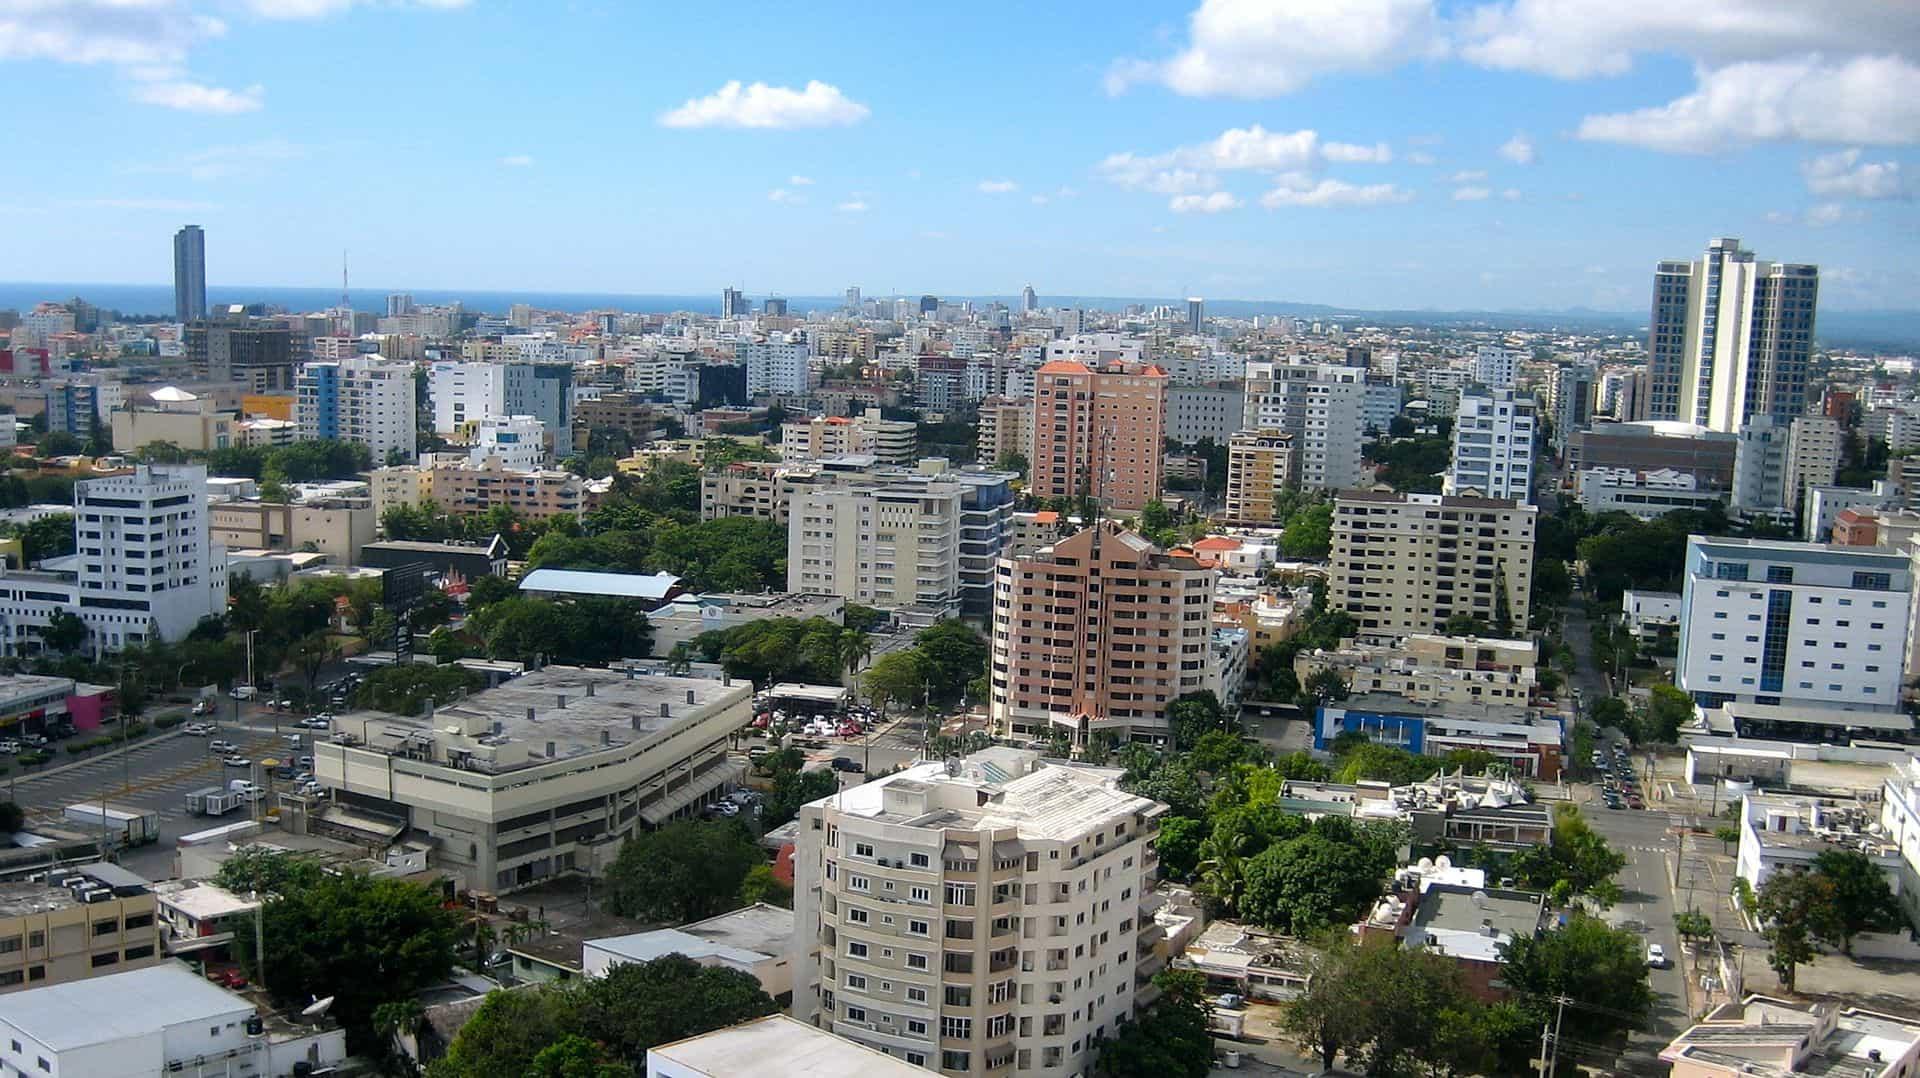 Houston To Miami Flight And Hotel